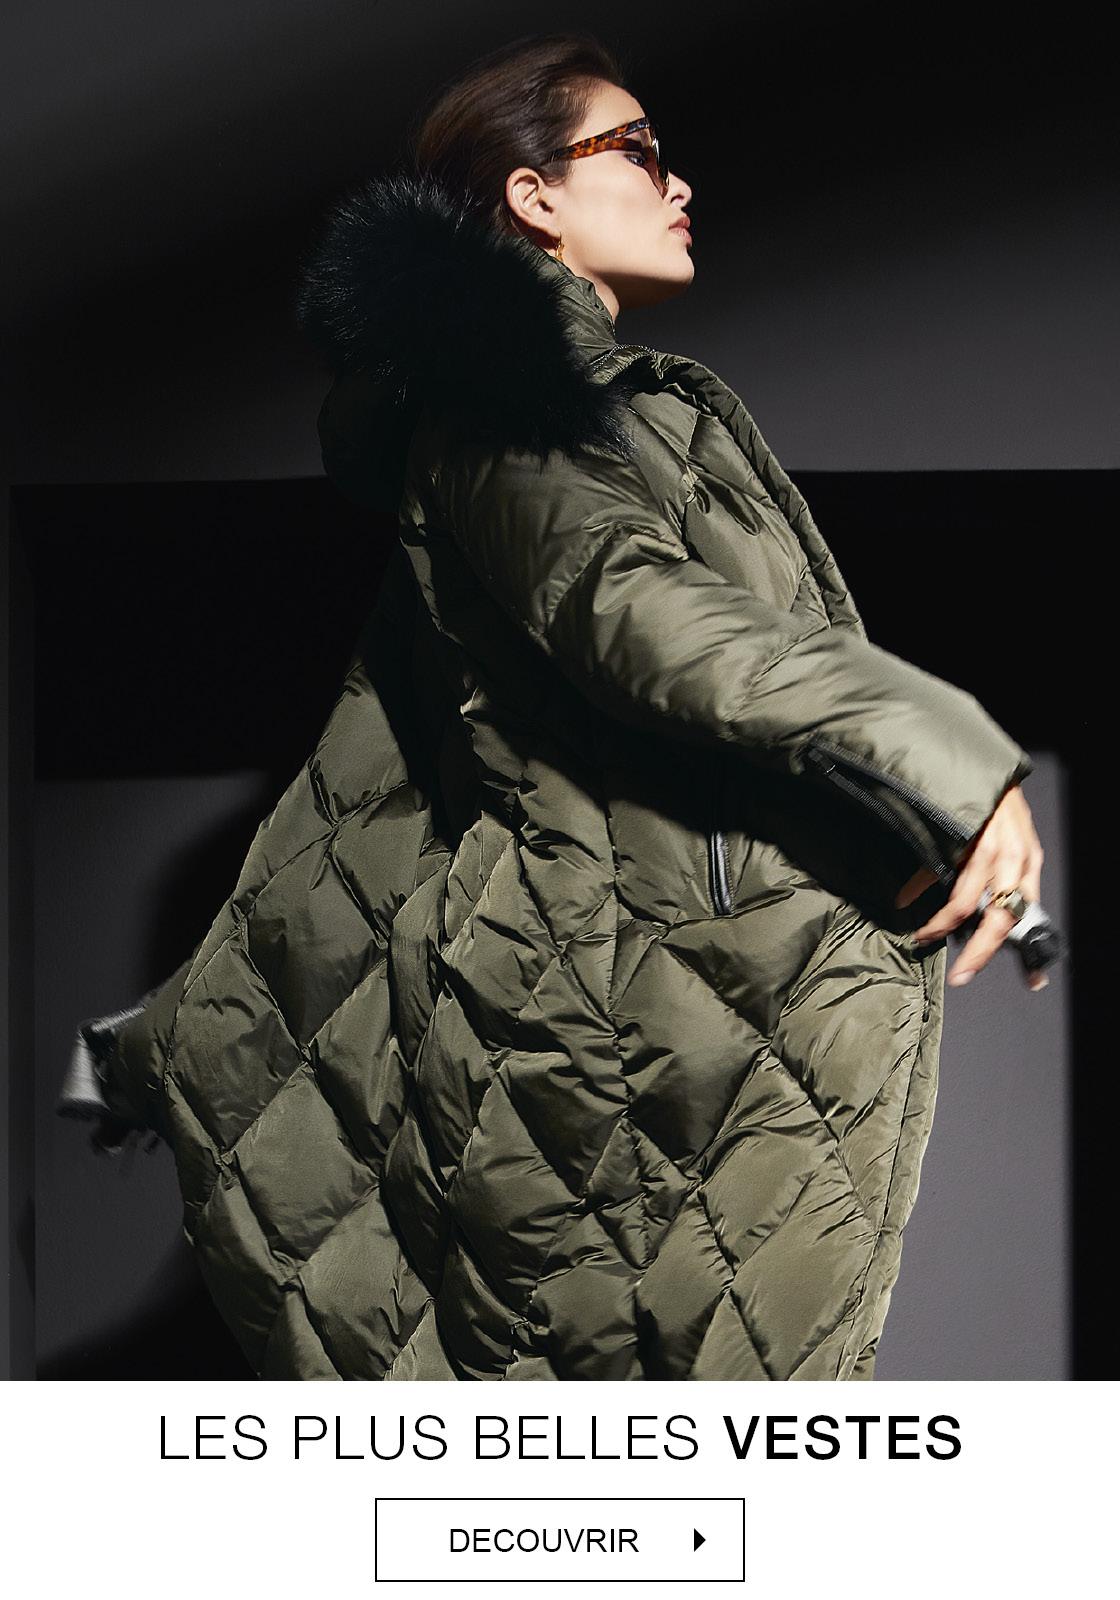 Grossiste vetement femme tendance fashion